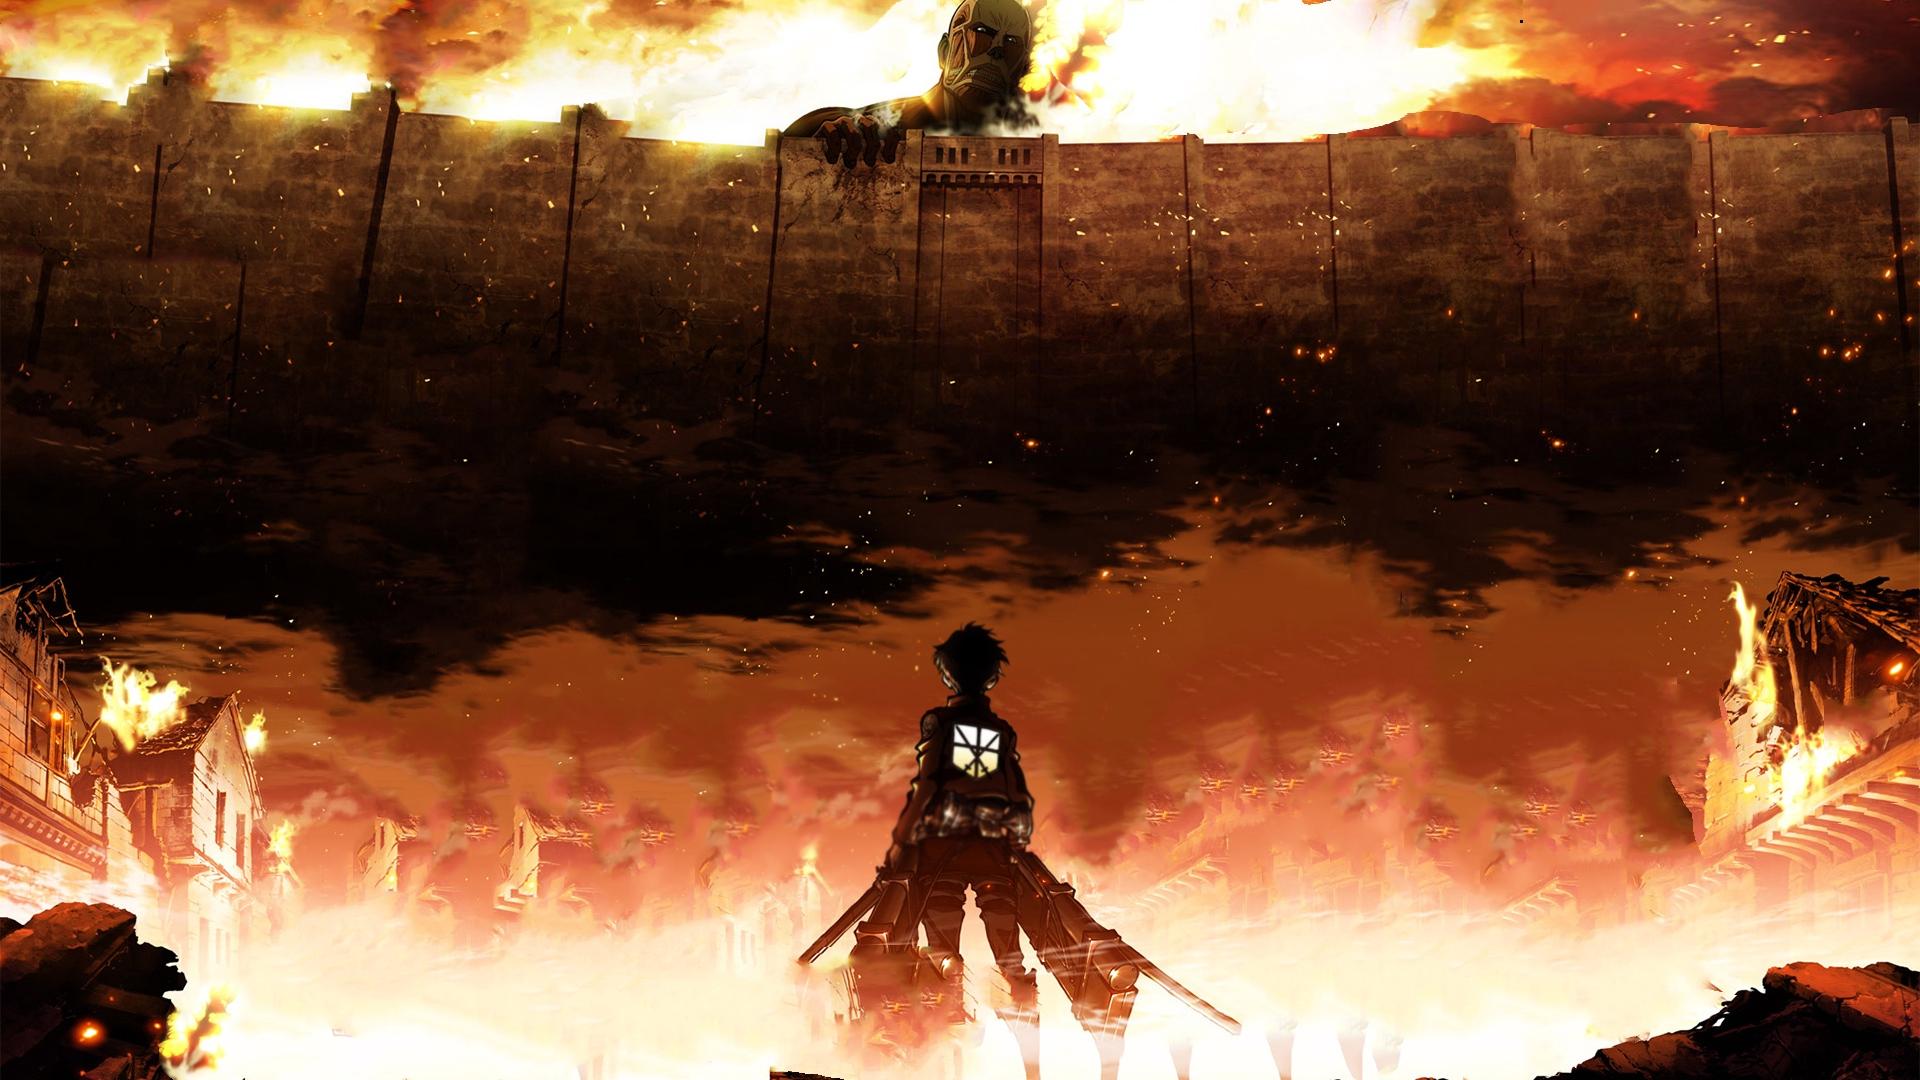 Wallpaper Attack On Titan Eren Jaeger Shingeki No Shingeki No Kyojin Wallpaper Hd 1920x1080 Wallpaper Teahub Io